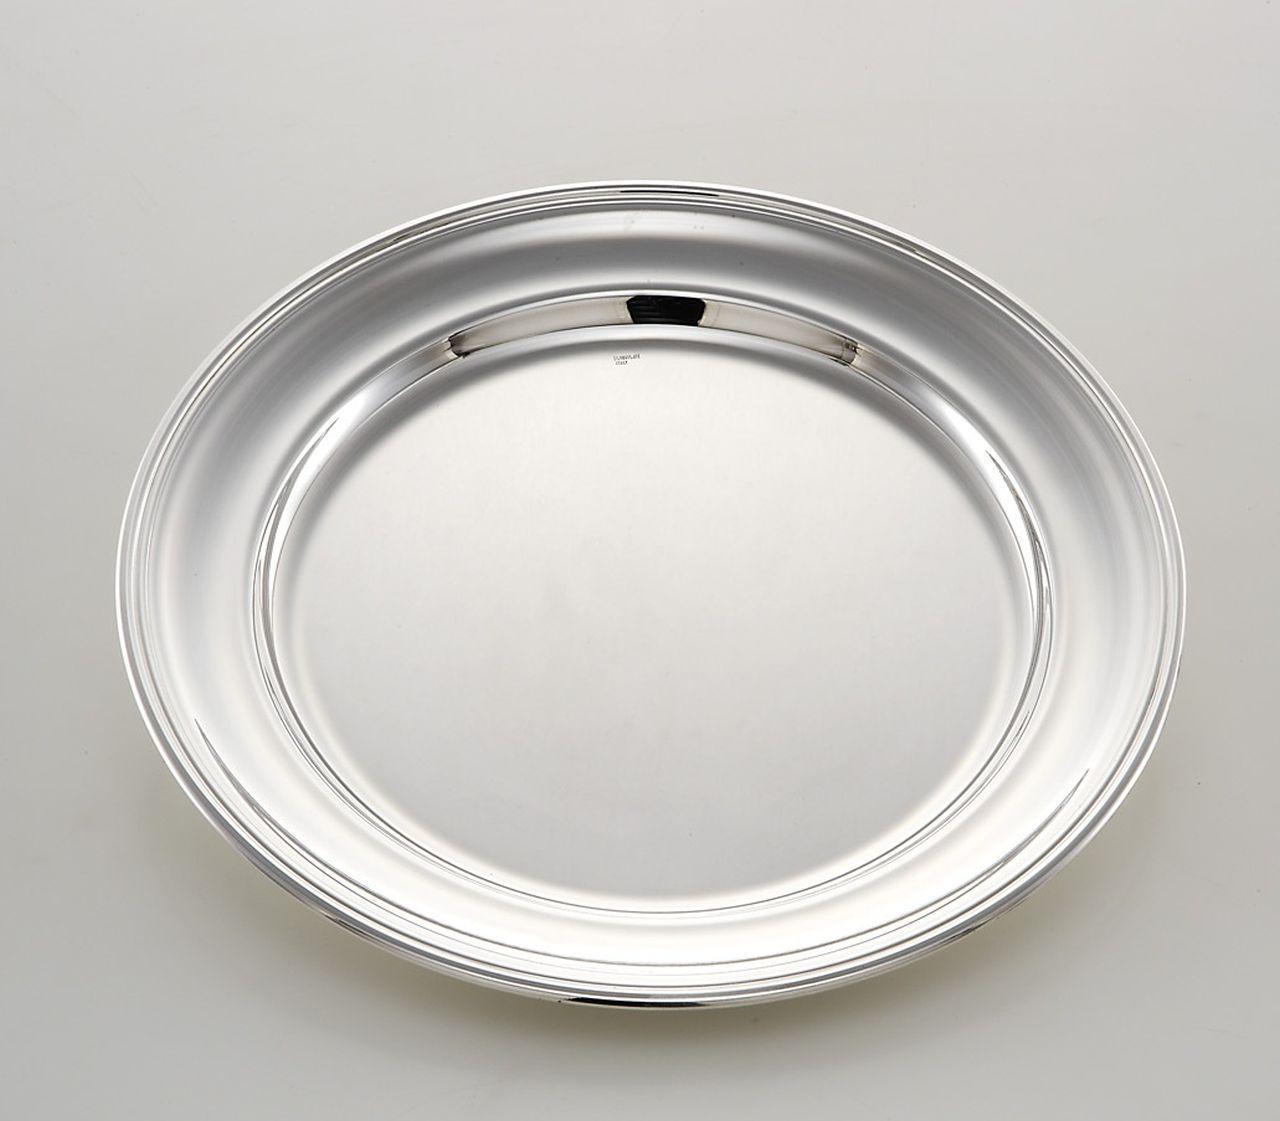 Piatto tondo portata stile Inglese argentato argento sheffield cm.diam.15